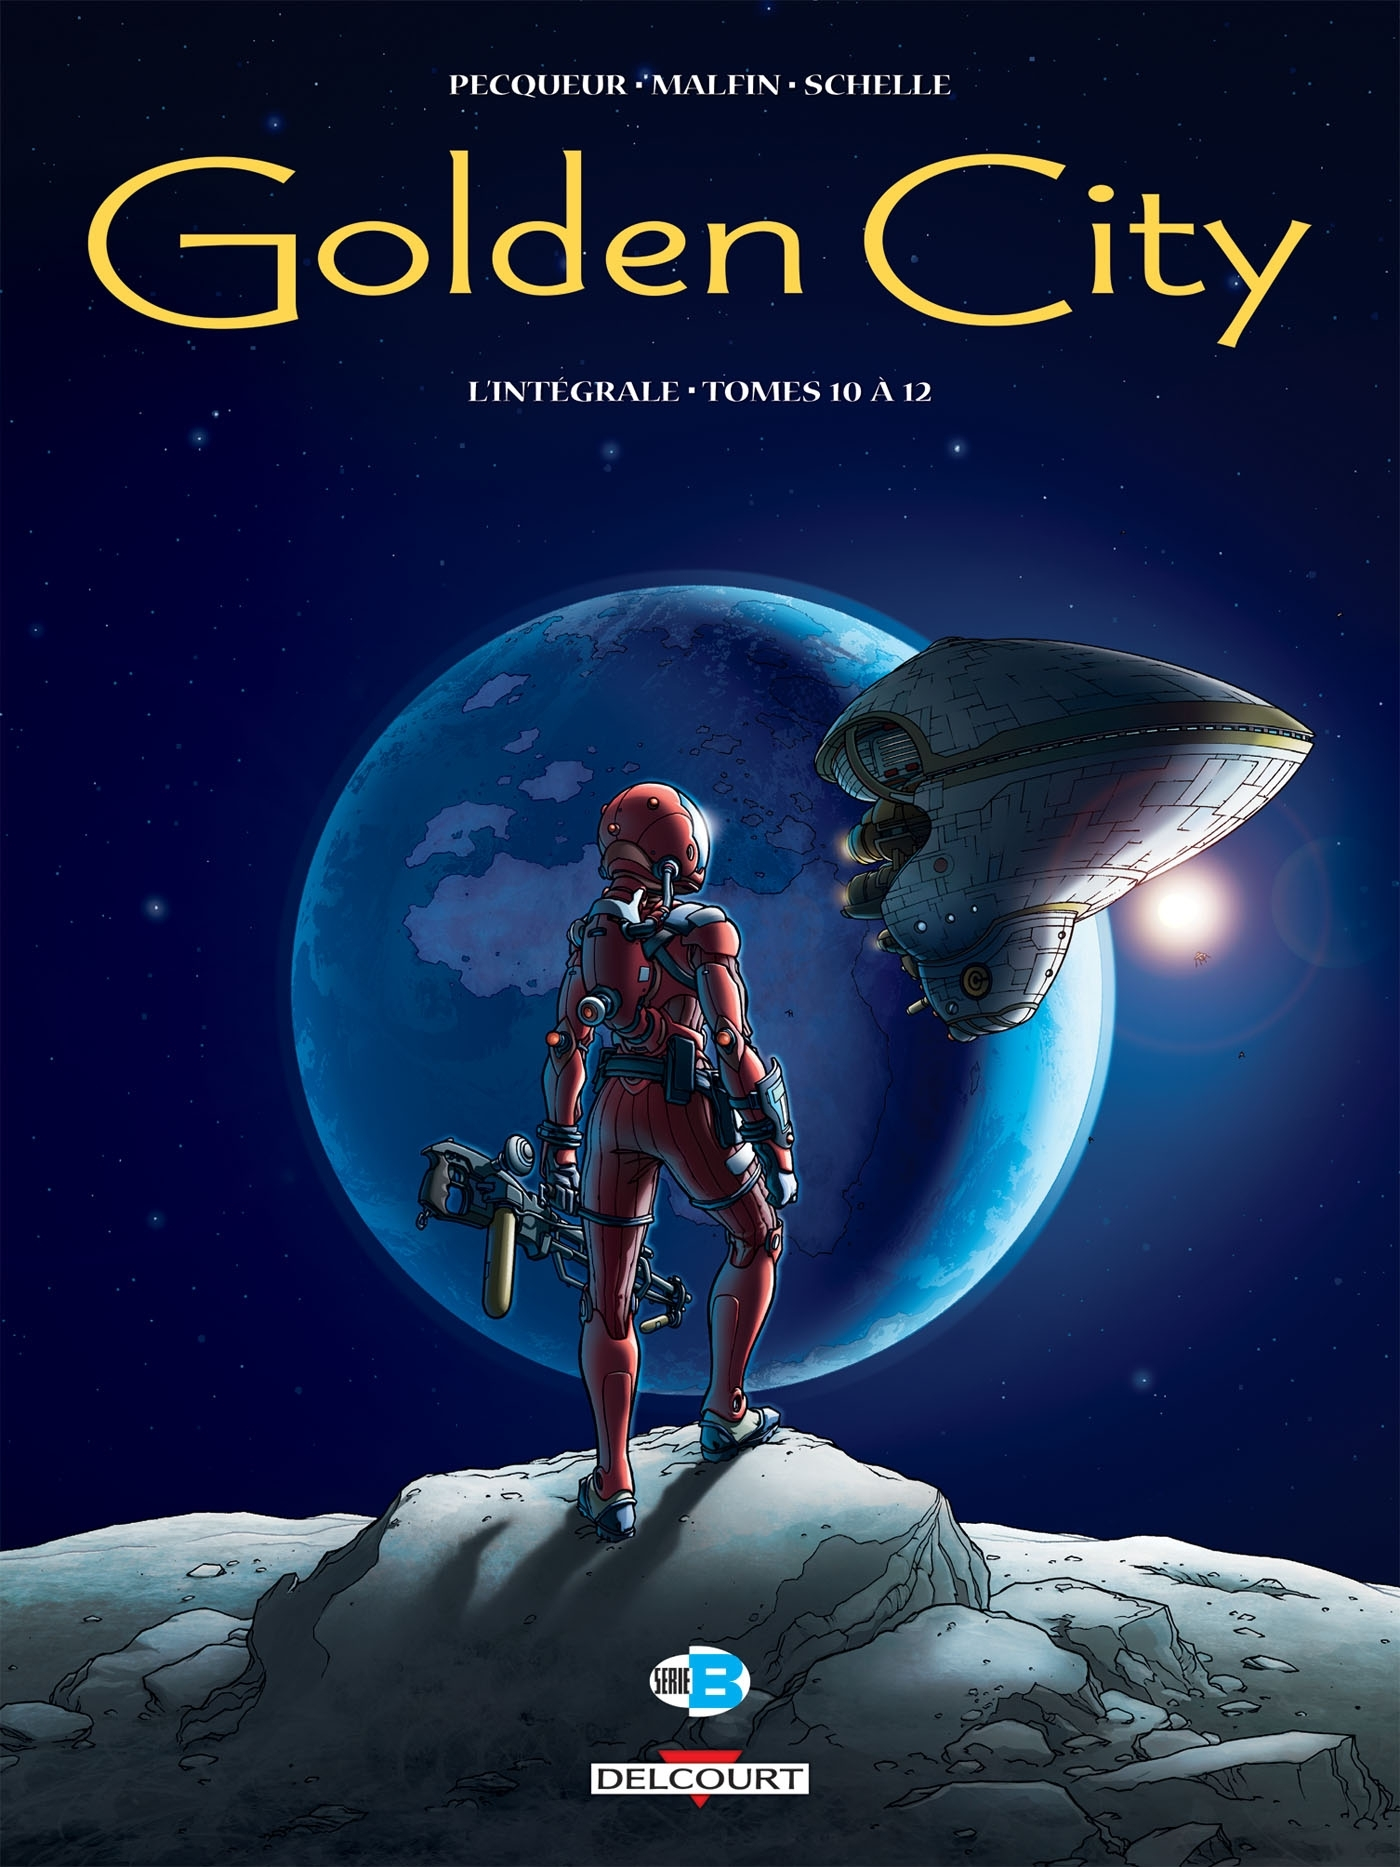 GOLDEN CITY - INTEGRALE T. 10 A 12